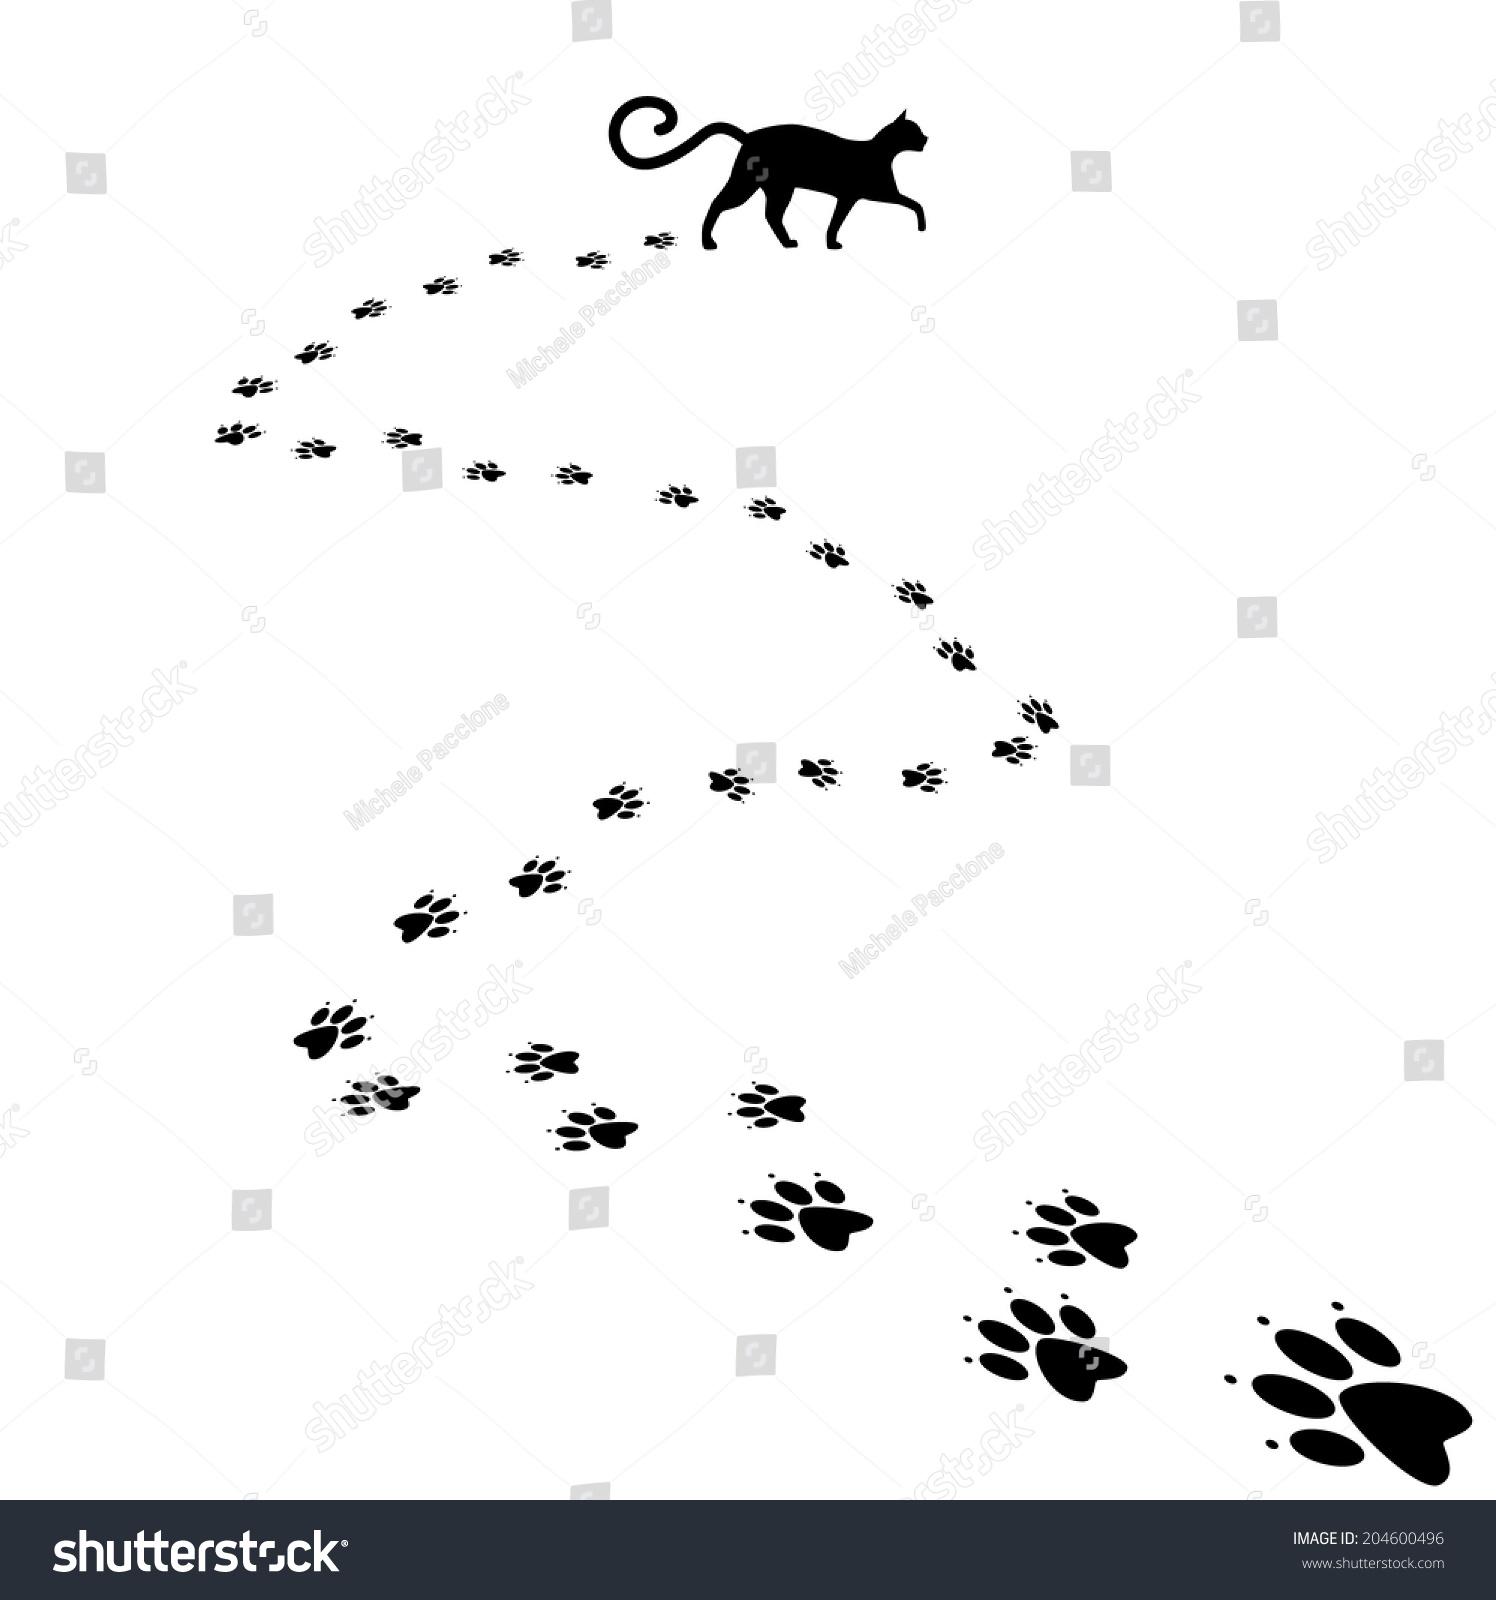 Cat paw print background